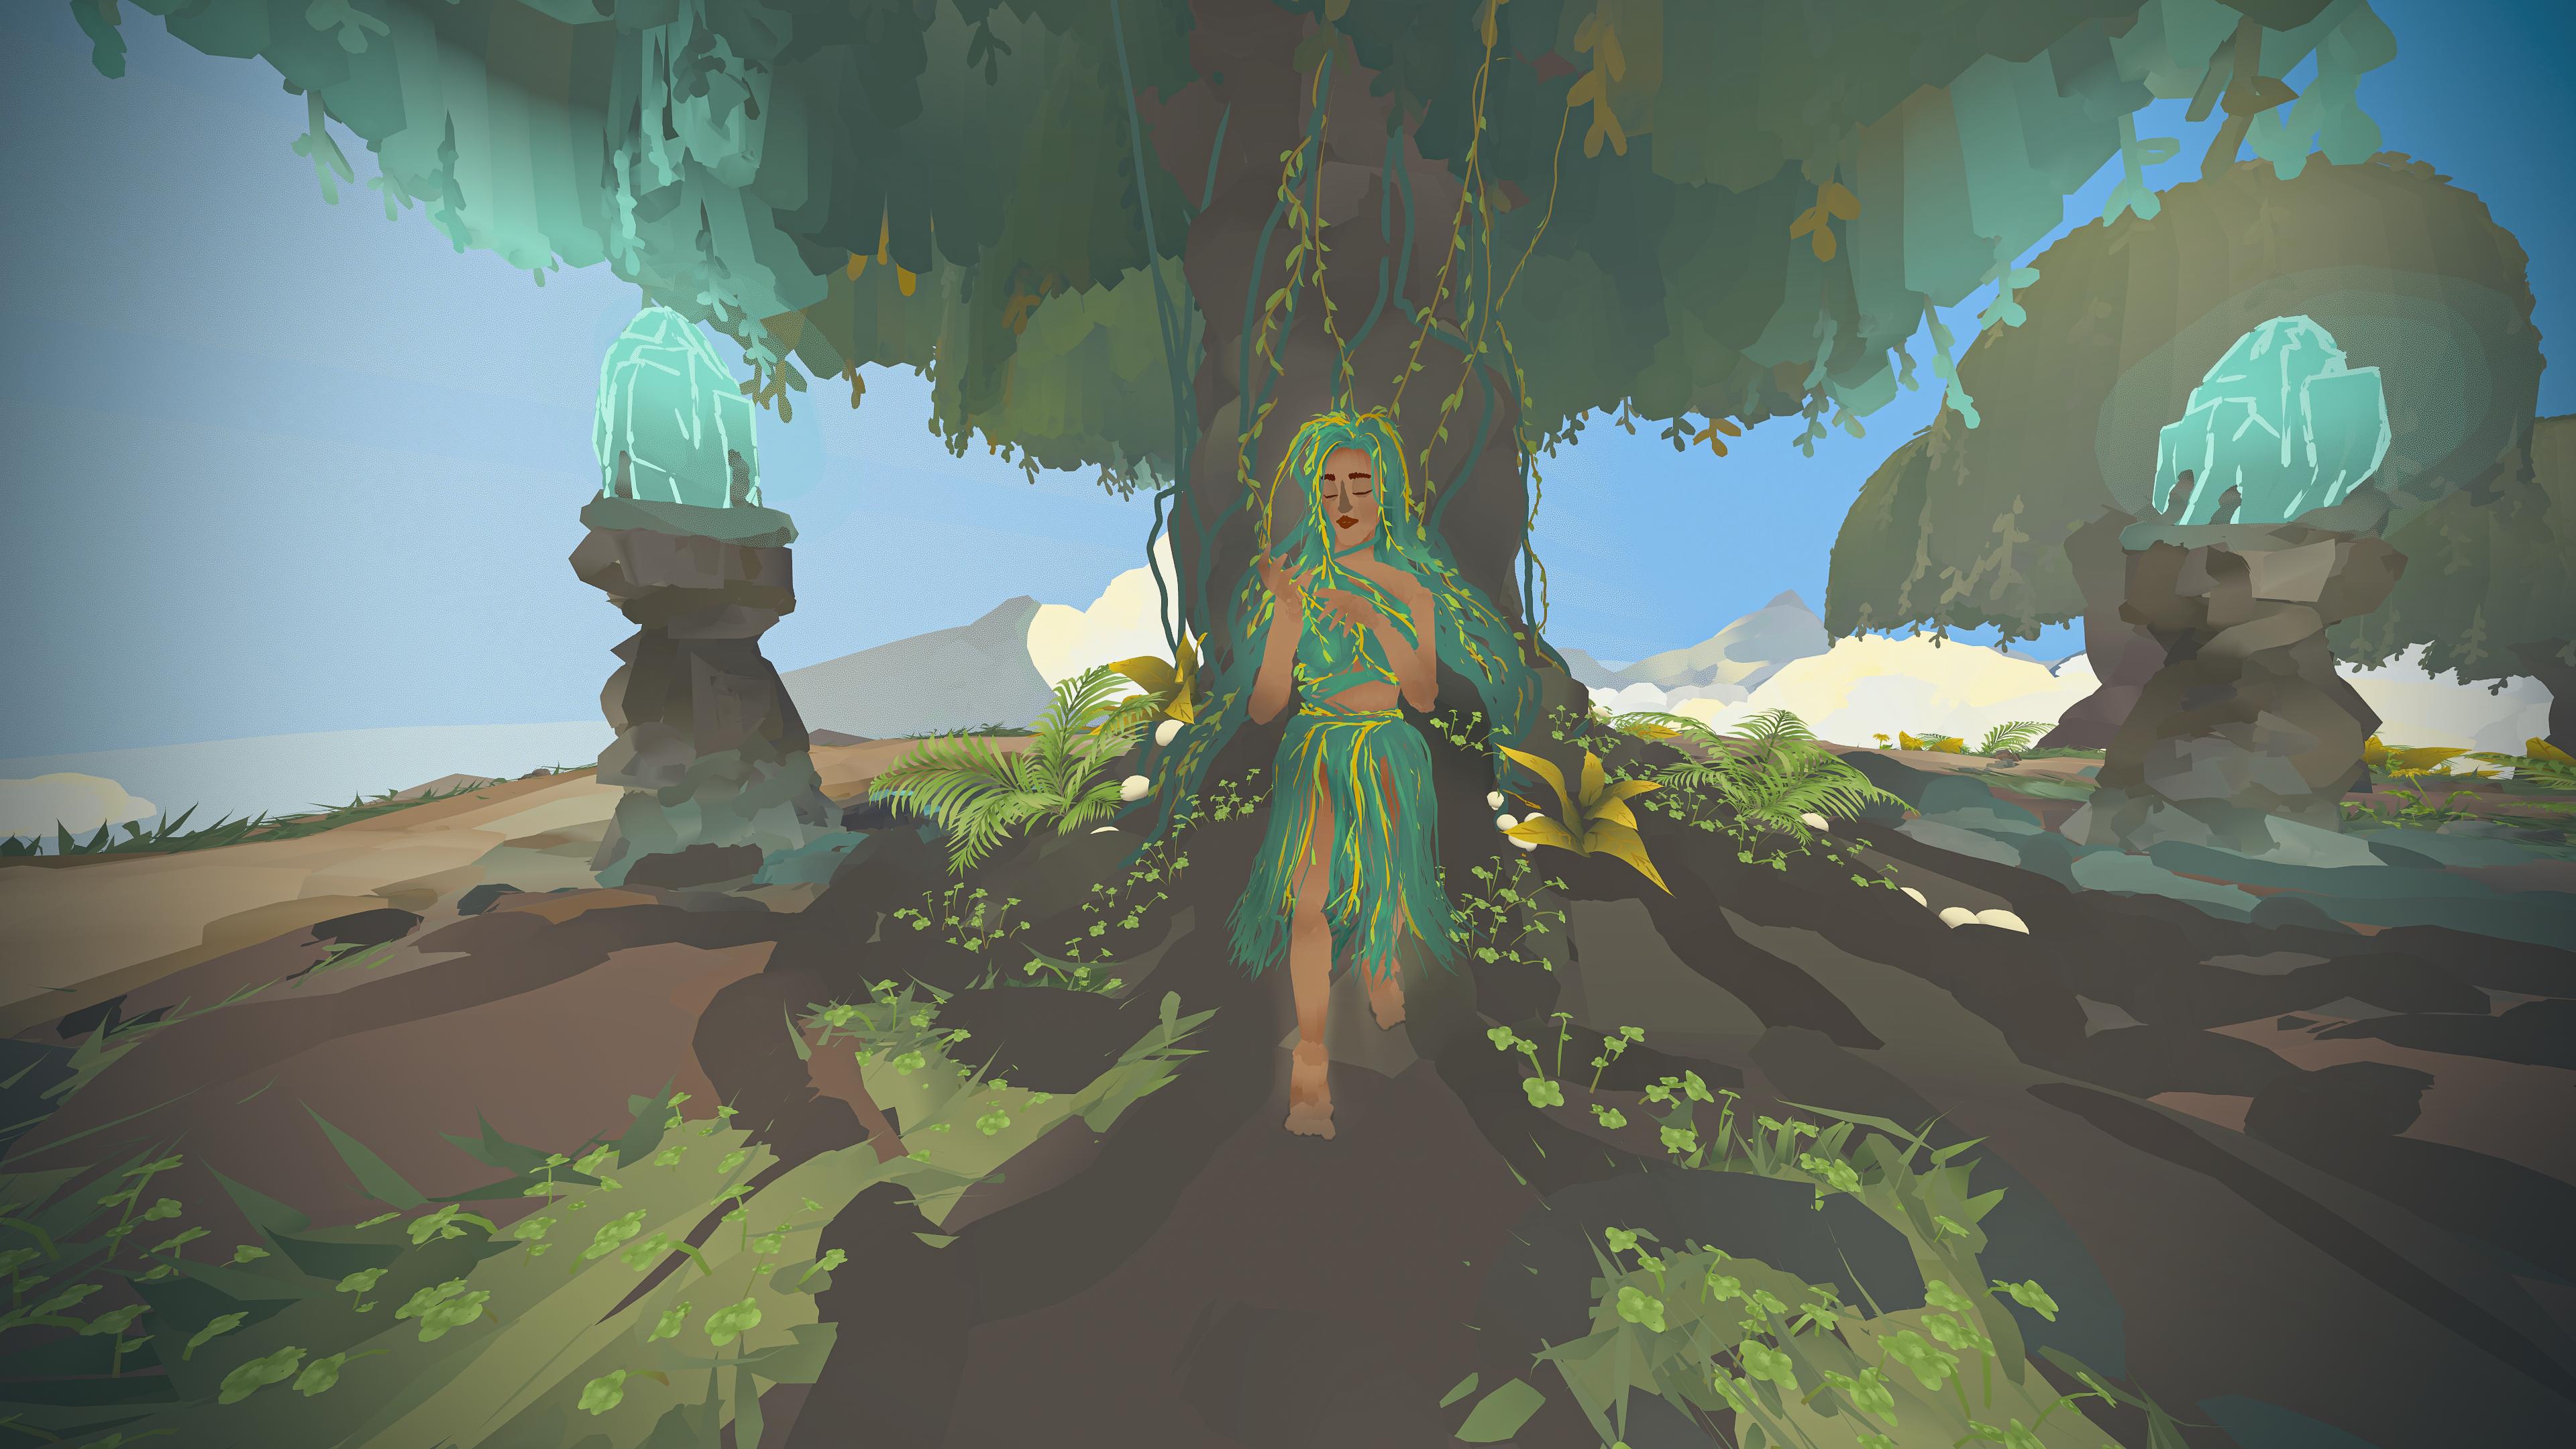 OrpheusVR Storyboard